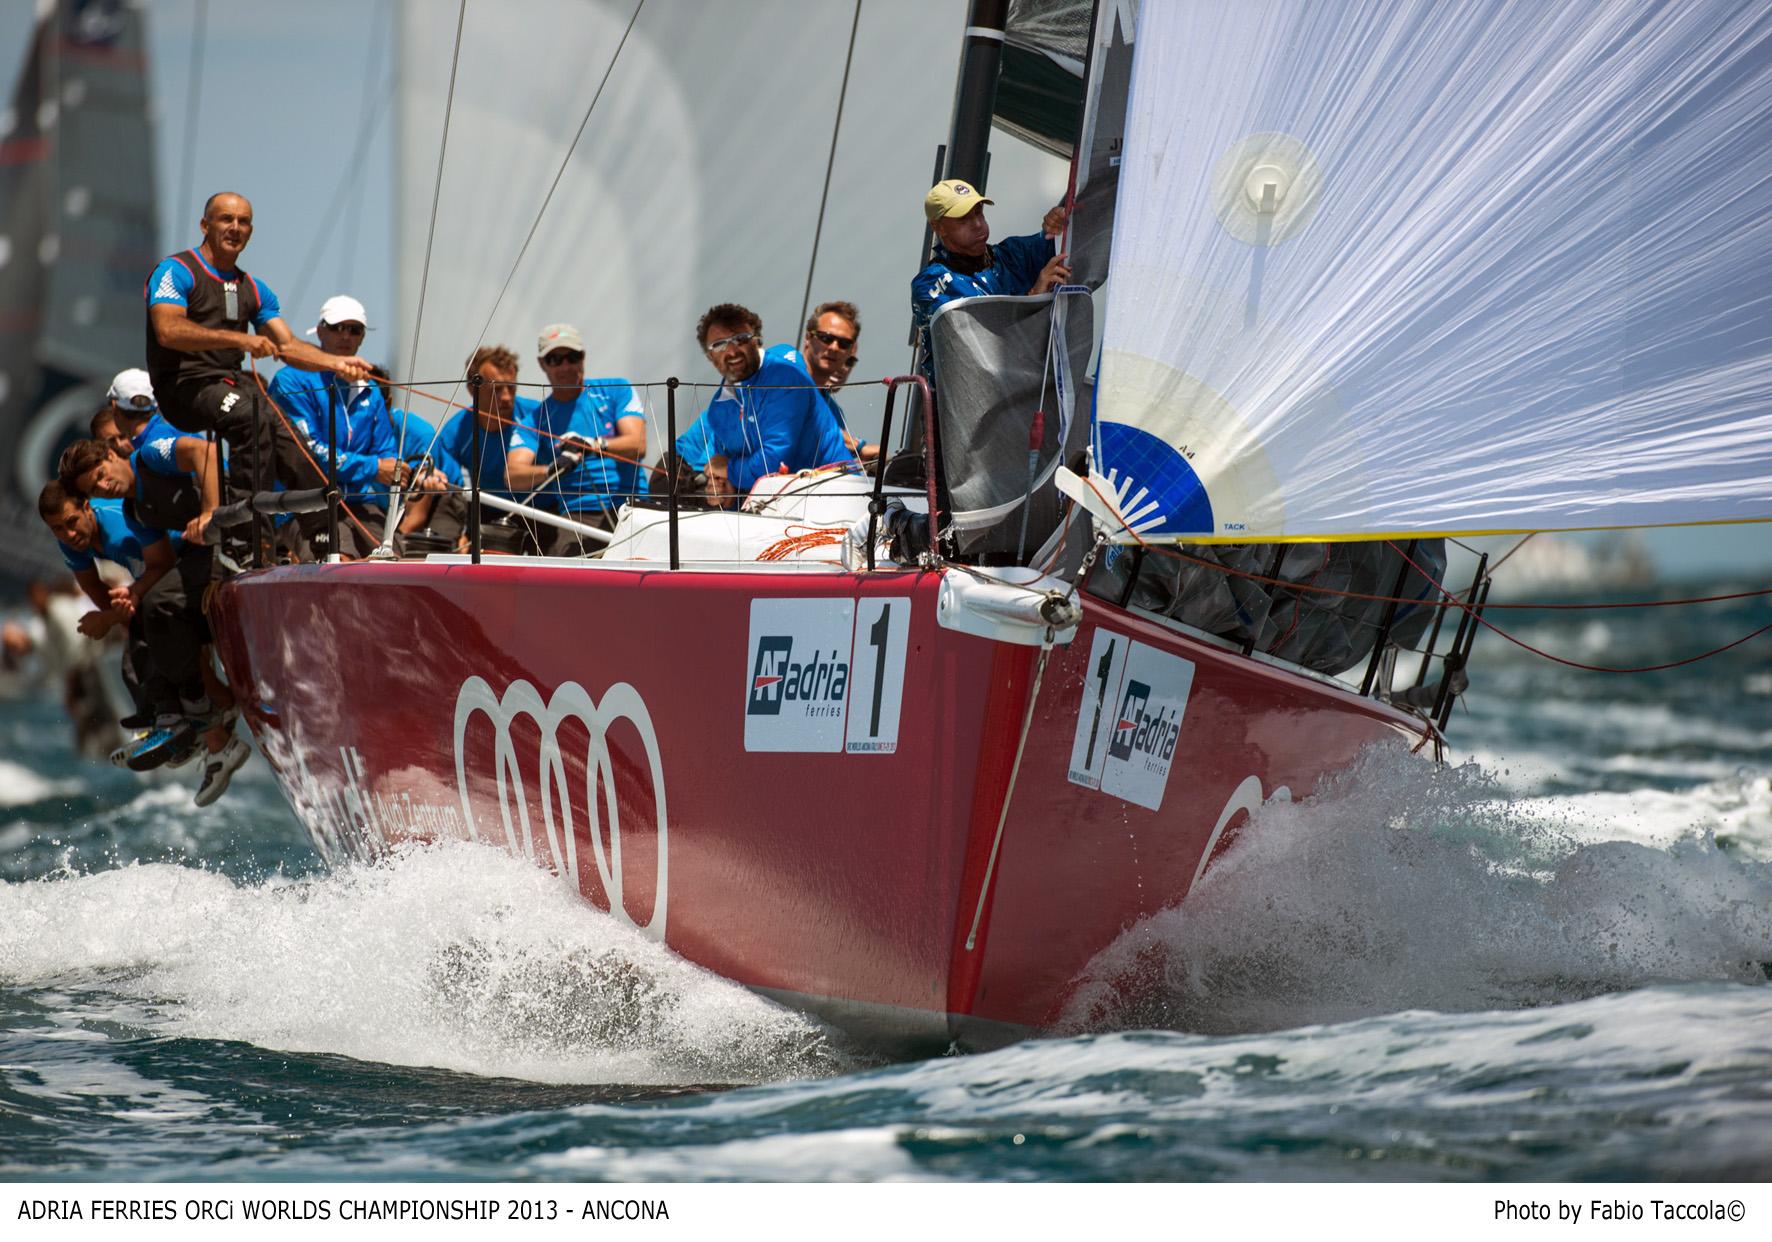 ADRIA ORC WORLD CHAMPIONSHIP 2013